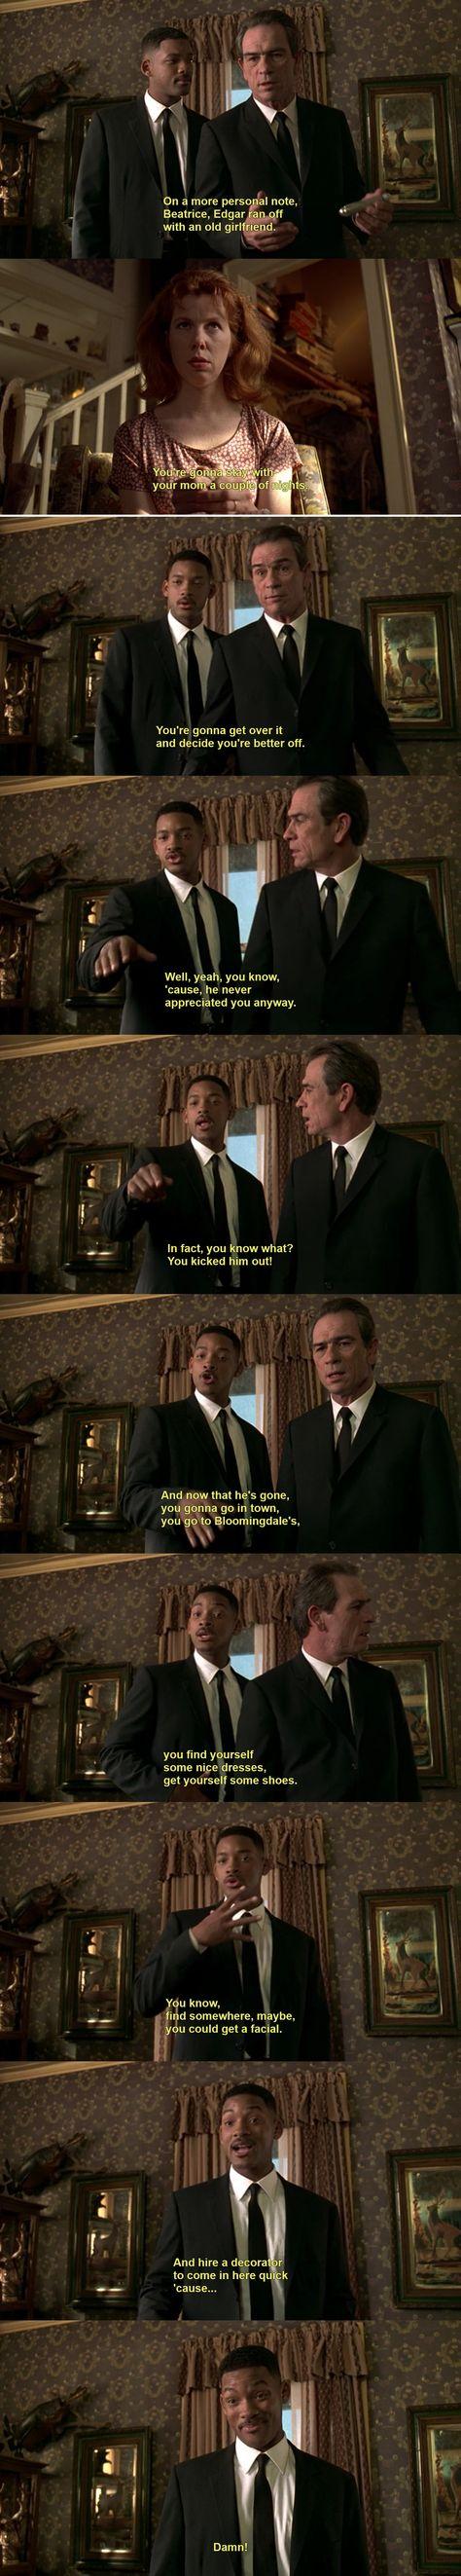 The proper way to put false memories in someone's mind. ---- Men In Black